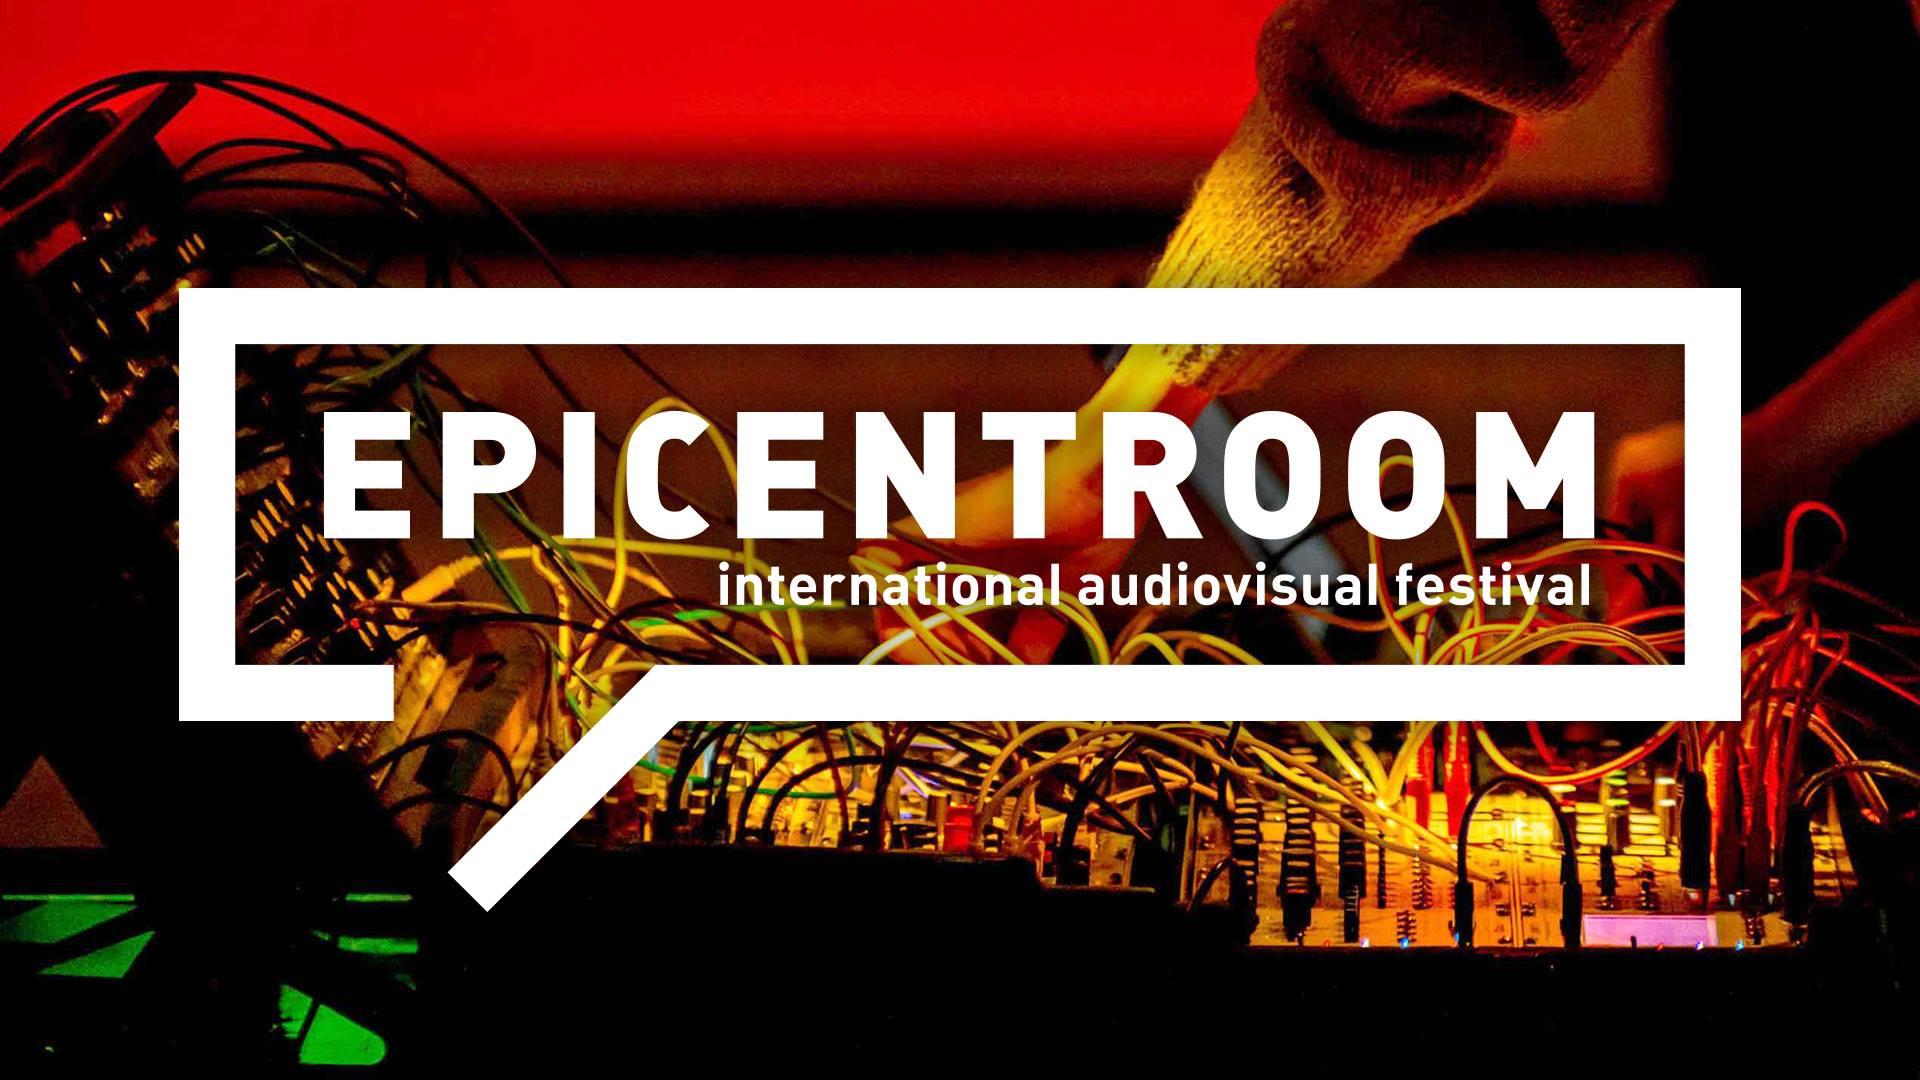 Epicentroom International Audiovisual Festival 2019